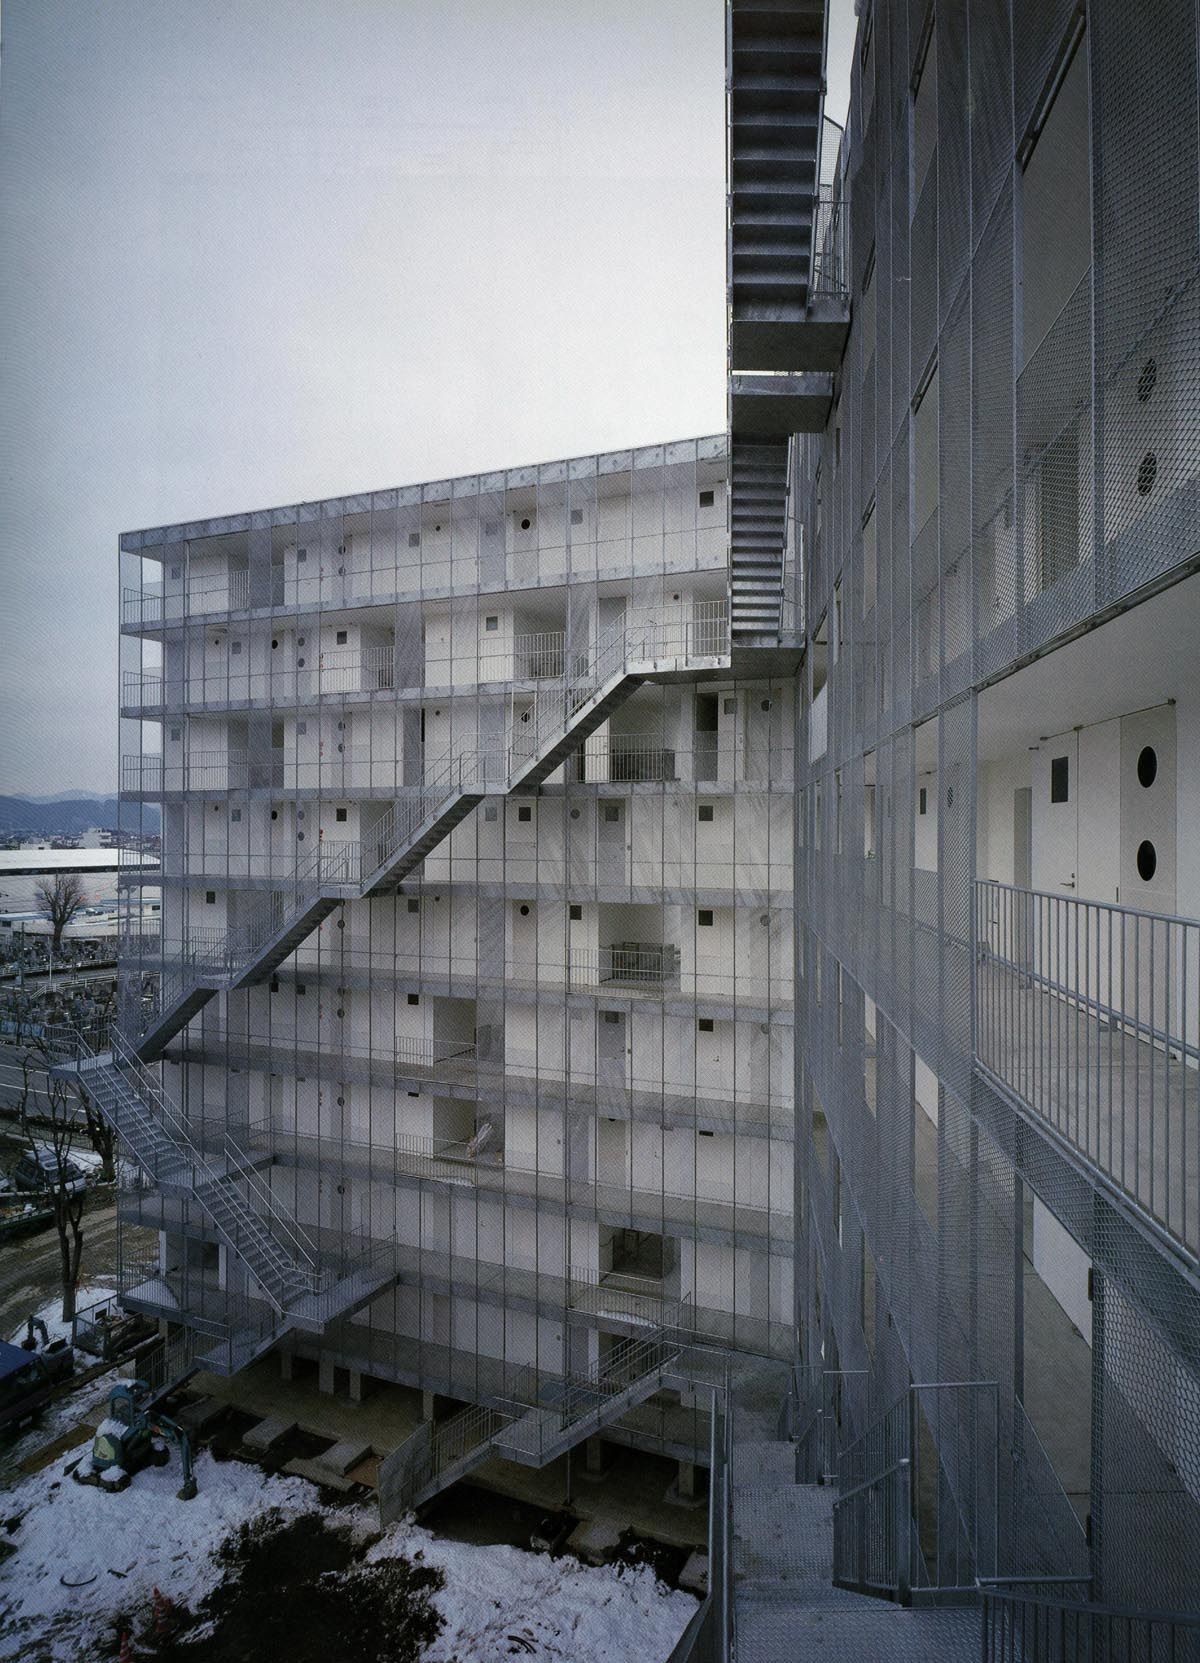 Just A Selection Kazuyo Sejima Gifu Kitagata Apartment Building Sanaa Trap Trappen Gaan Facade Architecture Structure Architecture Stairs Architecture